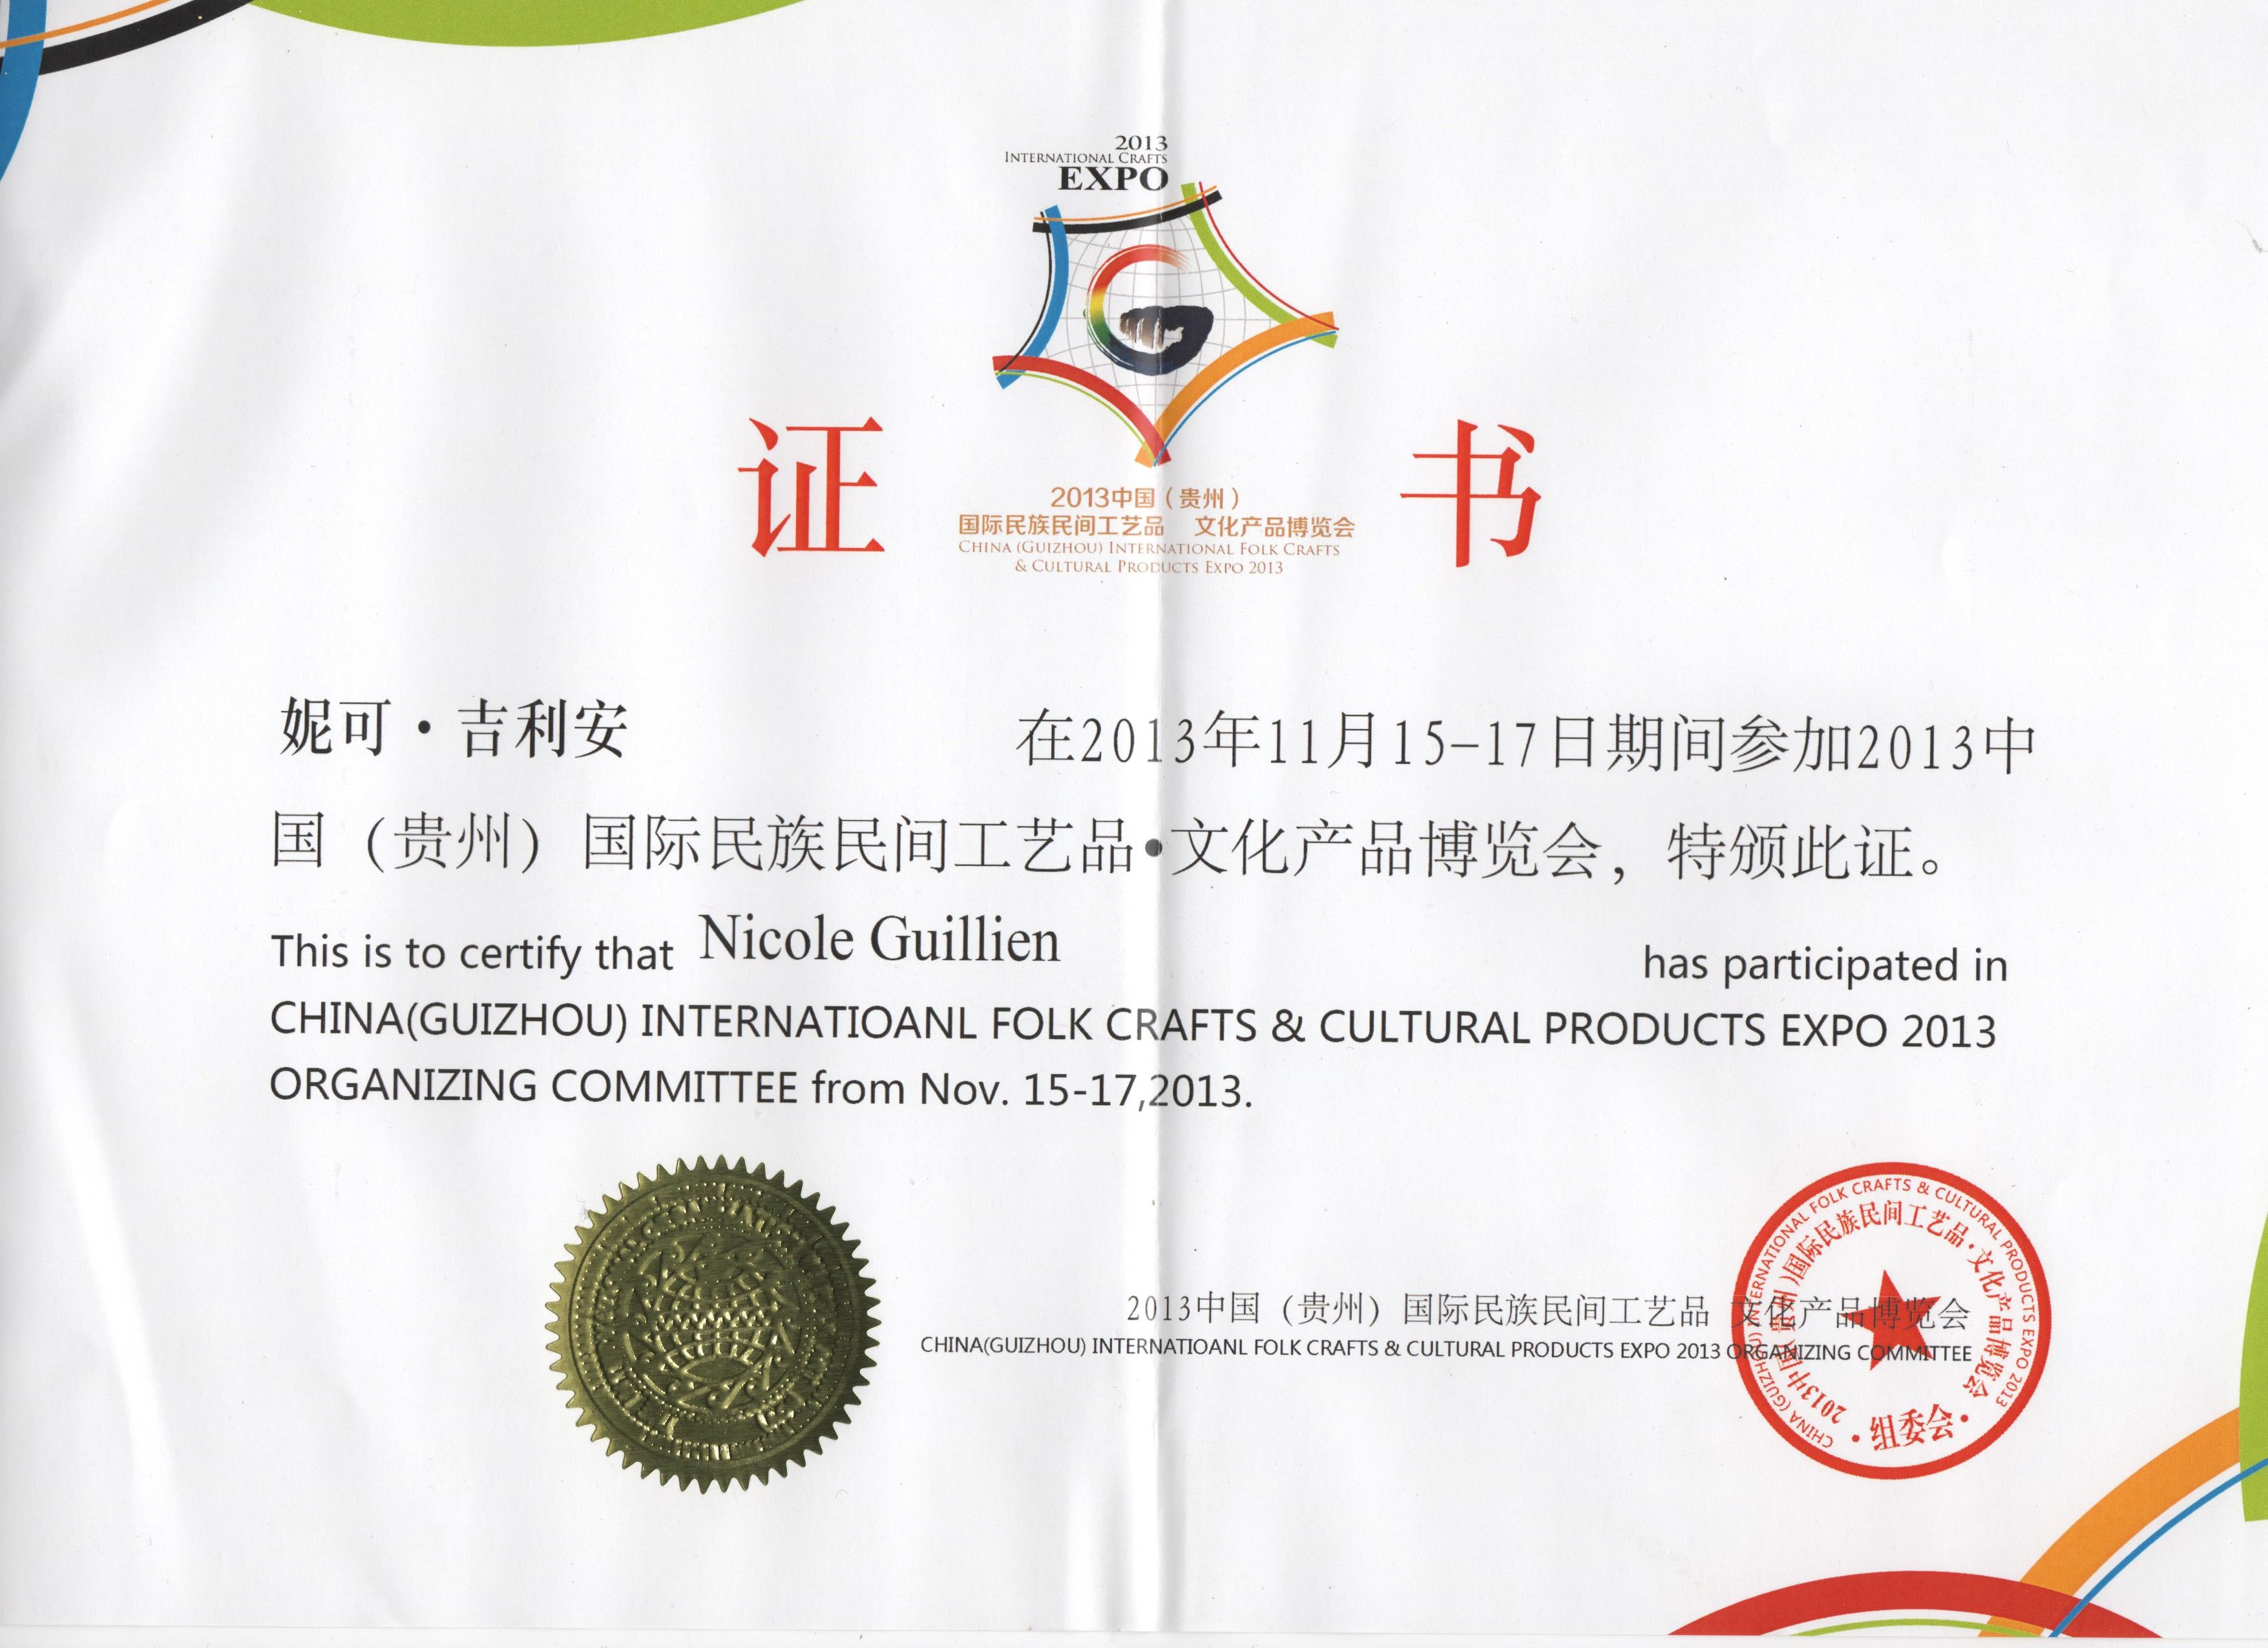 certificat chine nov 2013 001